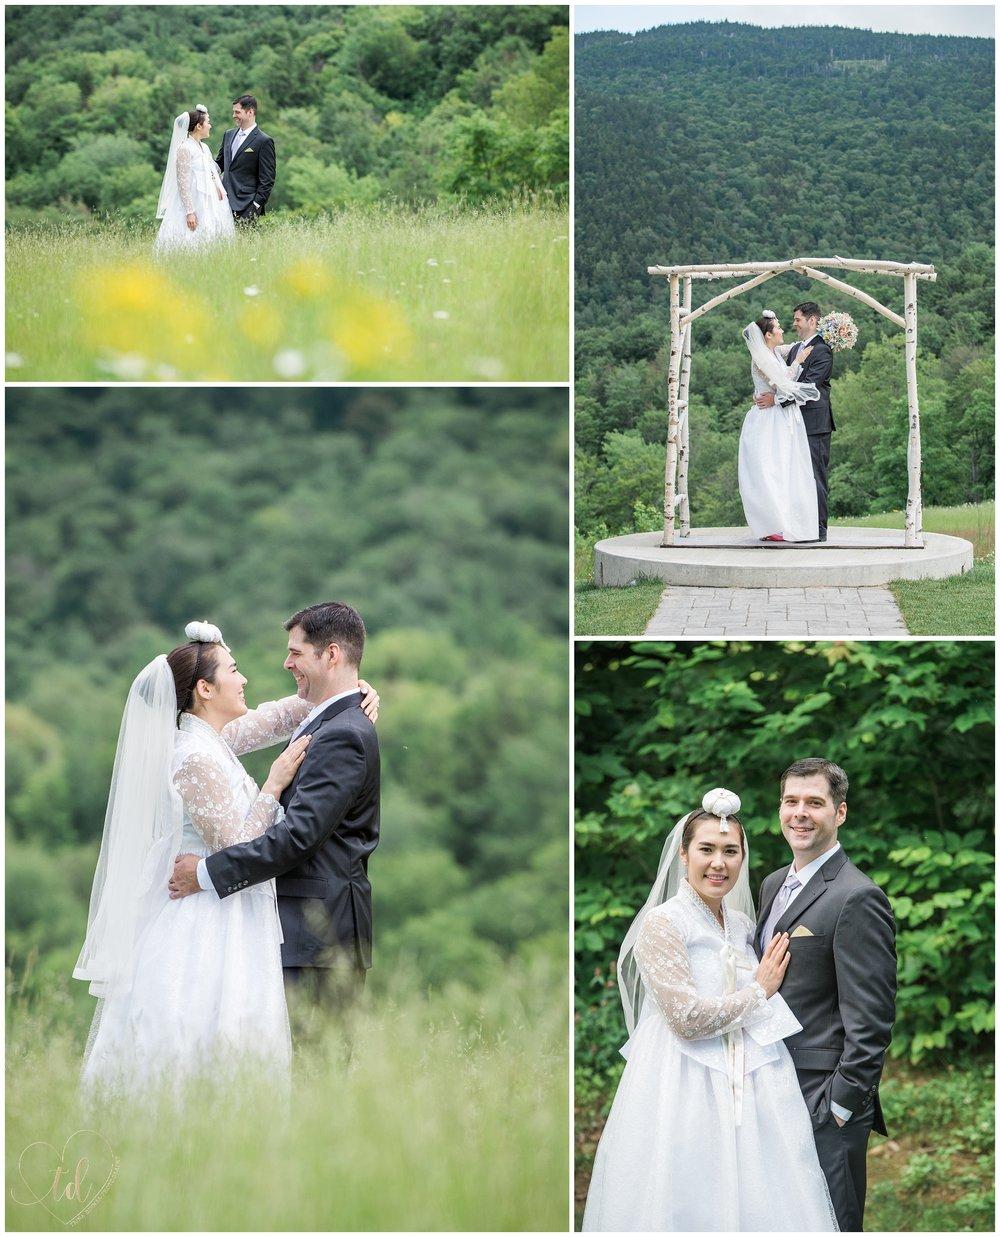 Jordan Hotel Sunday River Wedding Co.